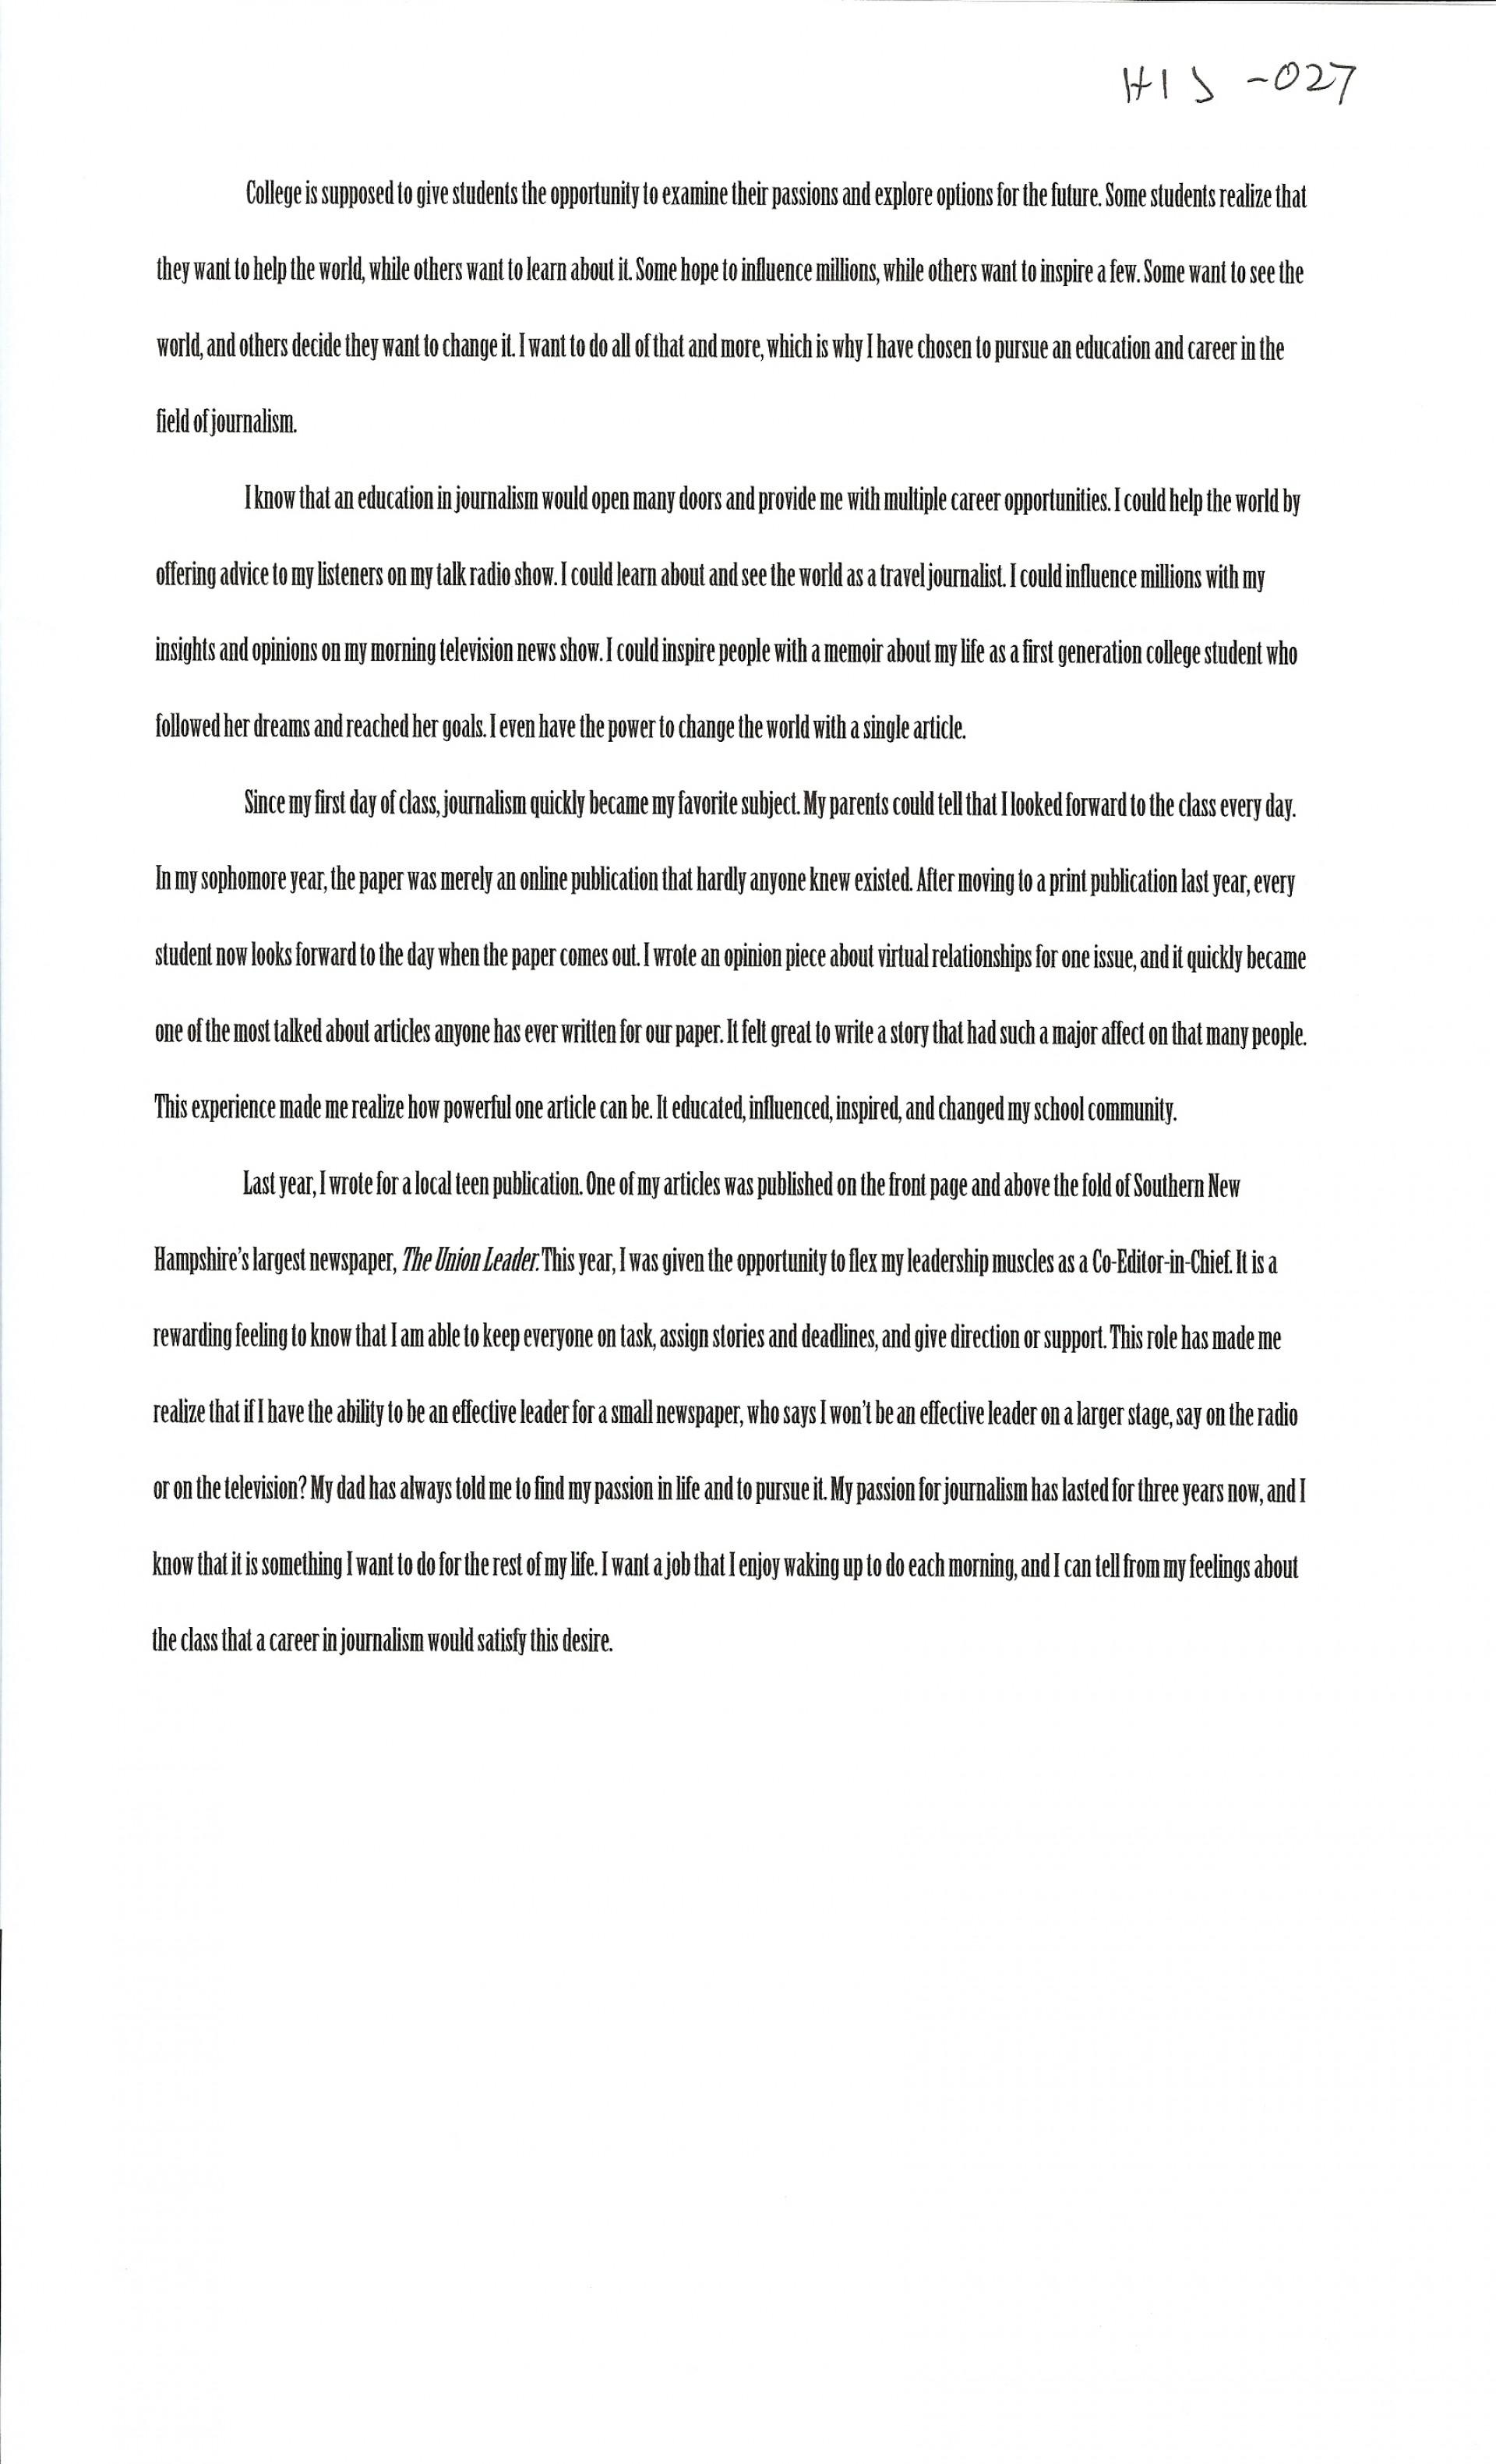 005 Alexa Serrecchia Essay Leaderships Unique Leadership Examples Application Sample Personal Philosophy Uc 1920